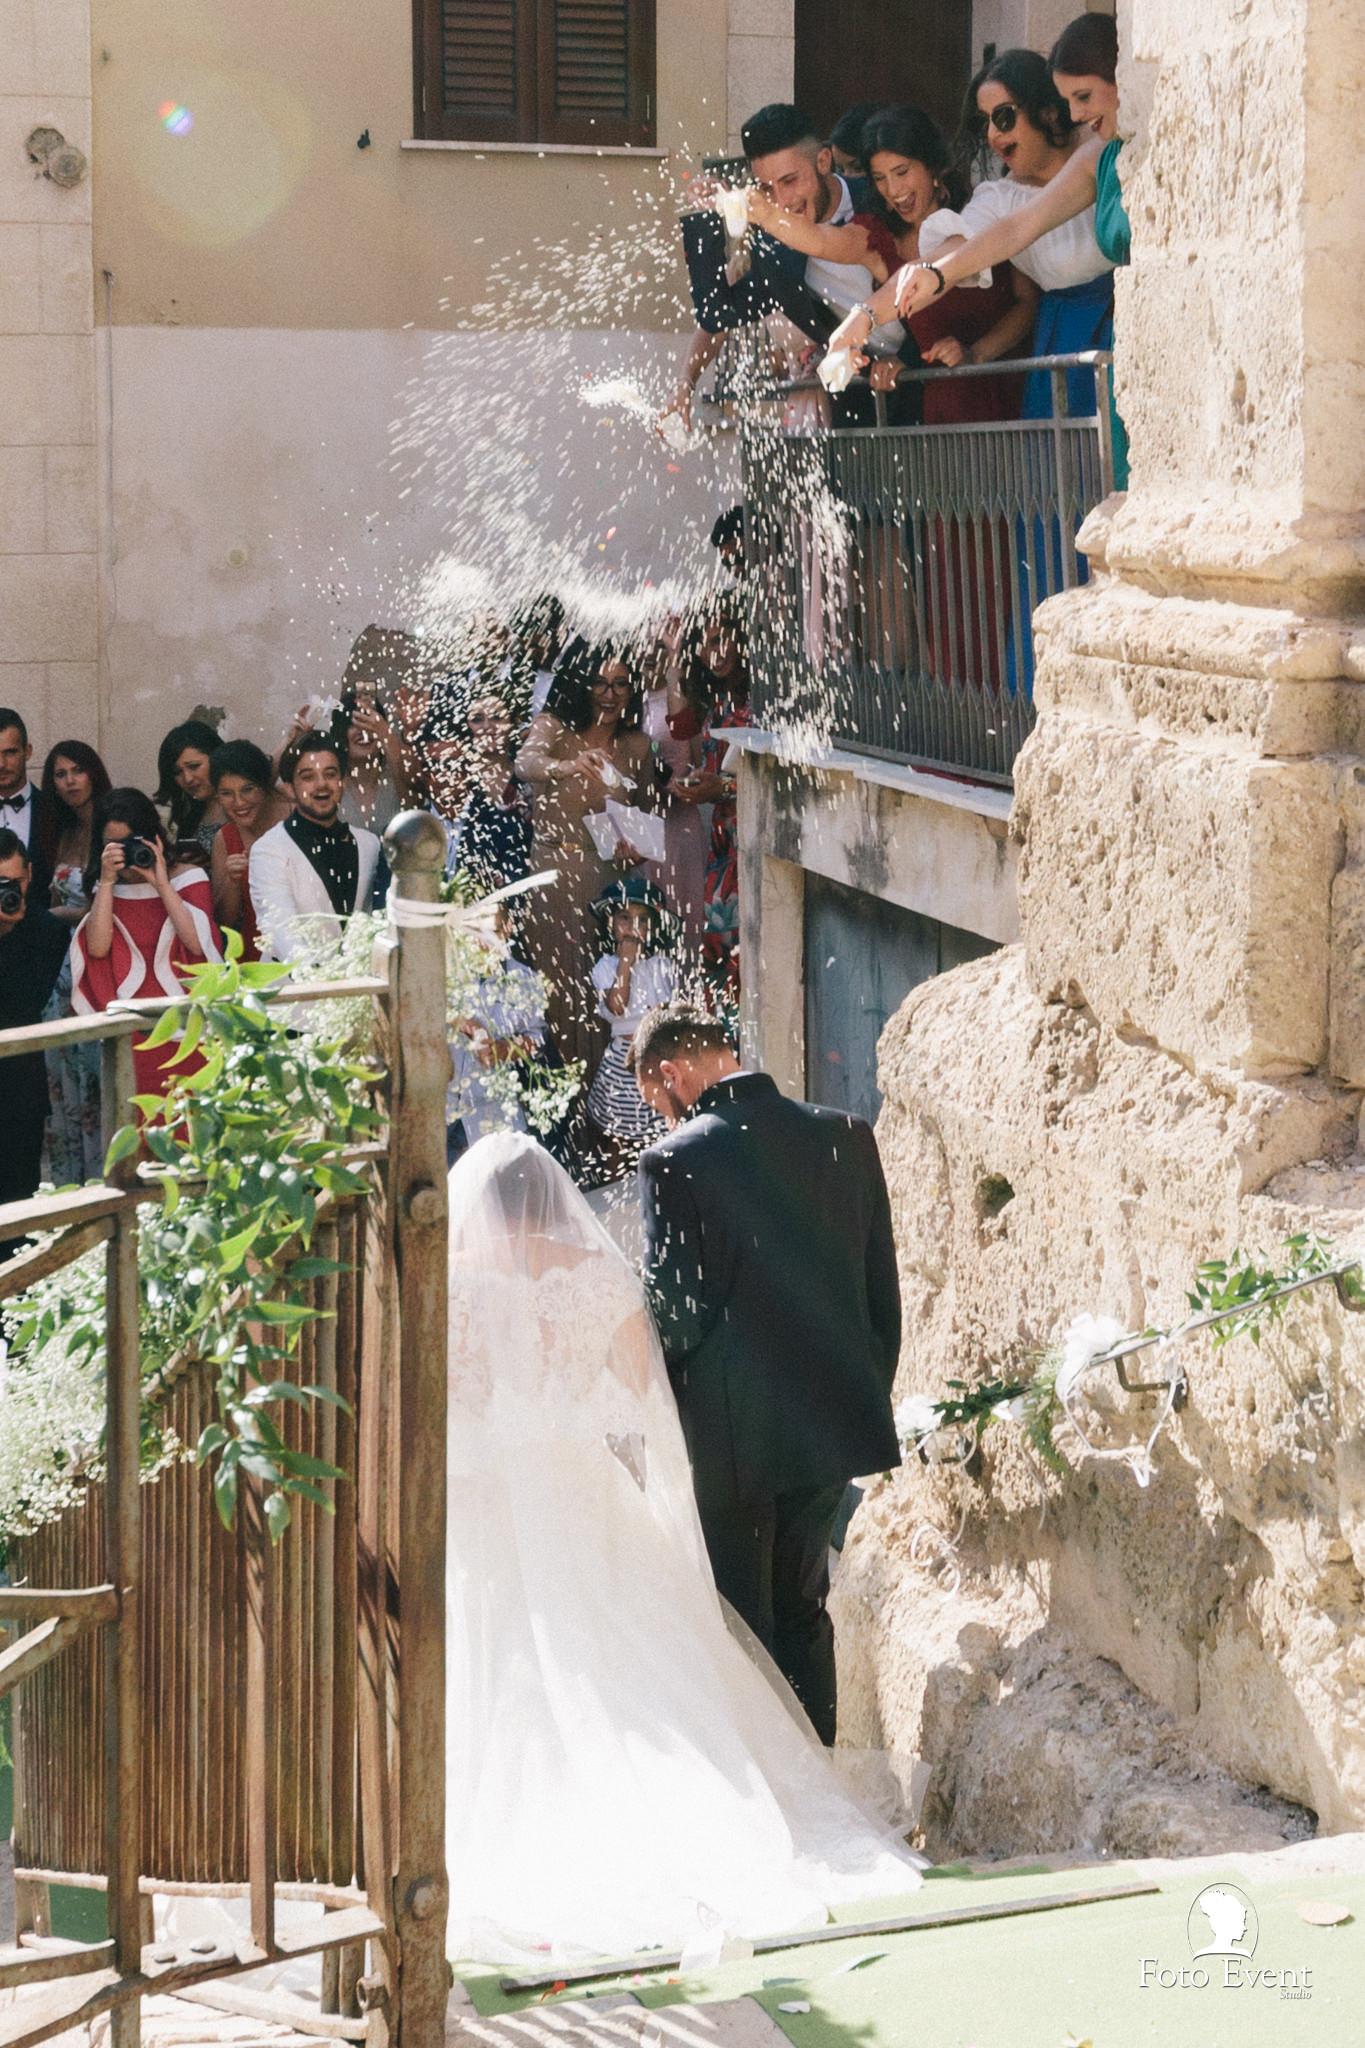 2018-06-29 Matrimonio Angelica e Angelo Bracco Fisheye 078